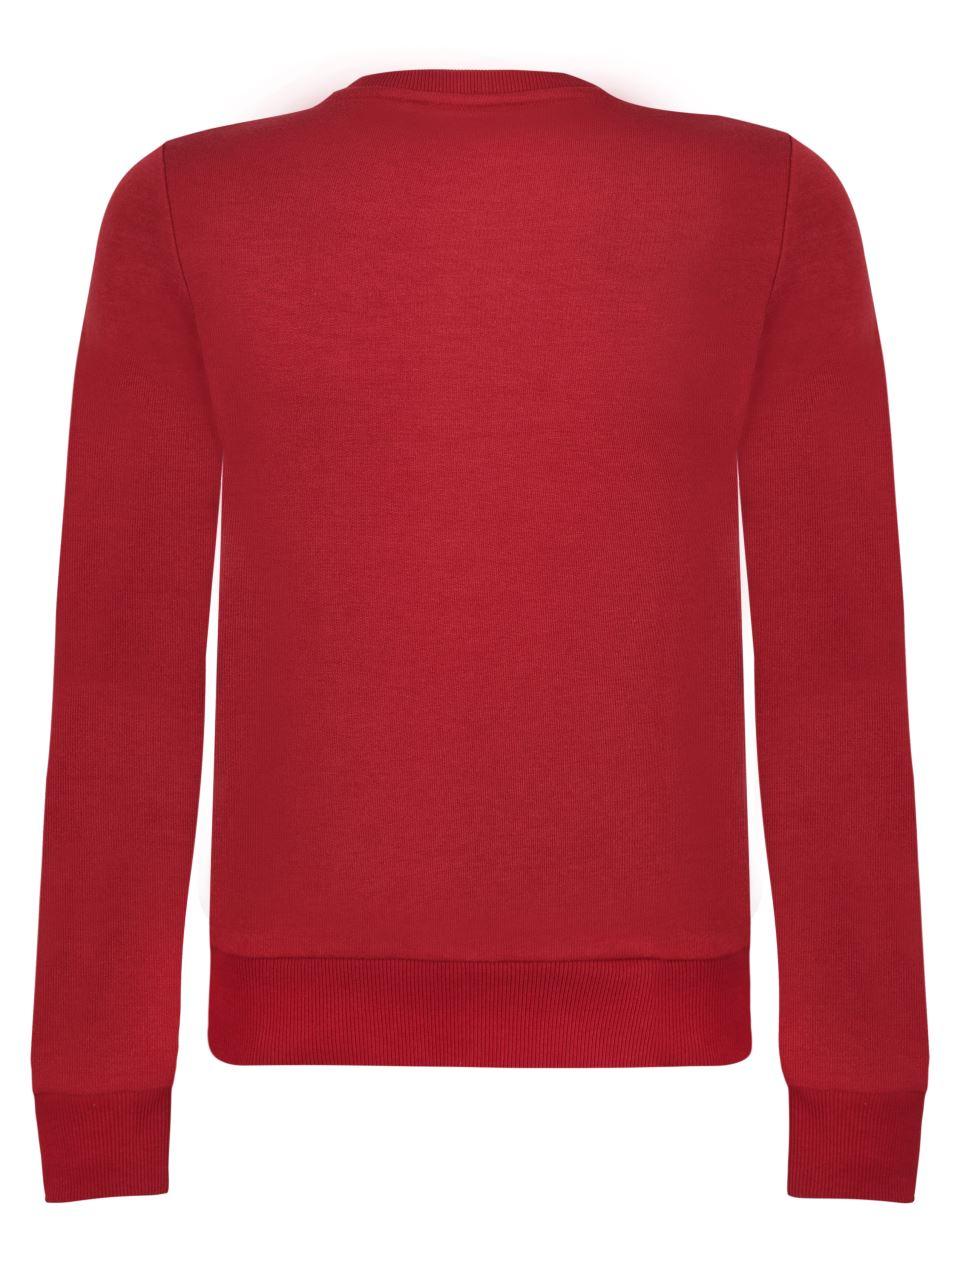 K85175 Sweatshirt